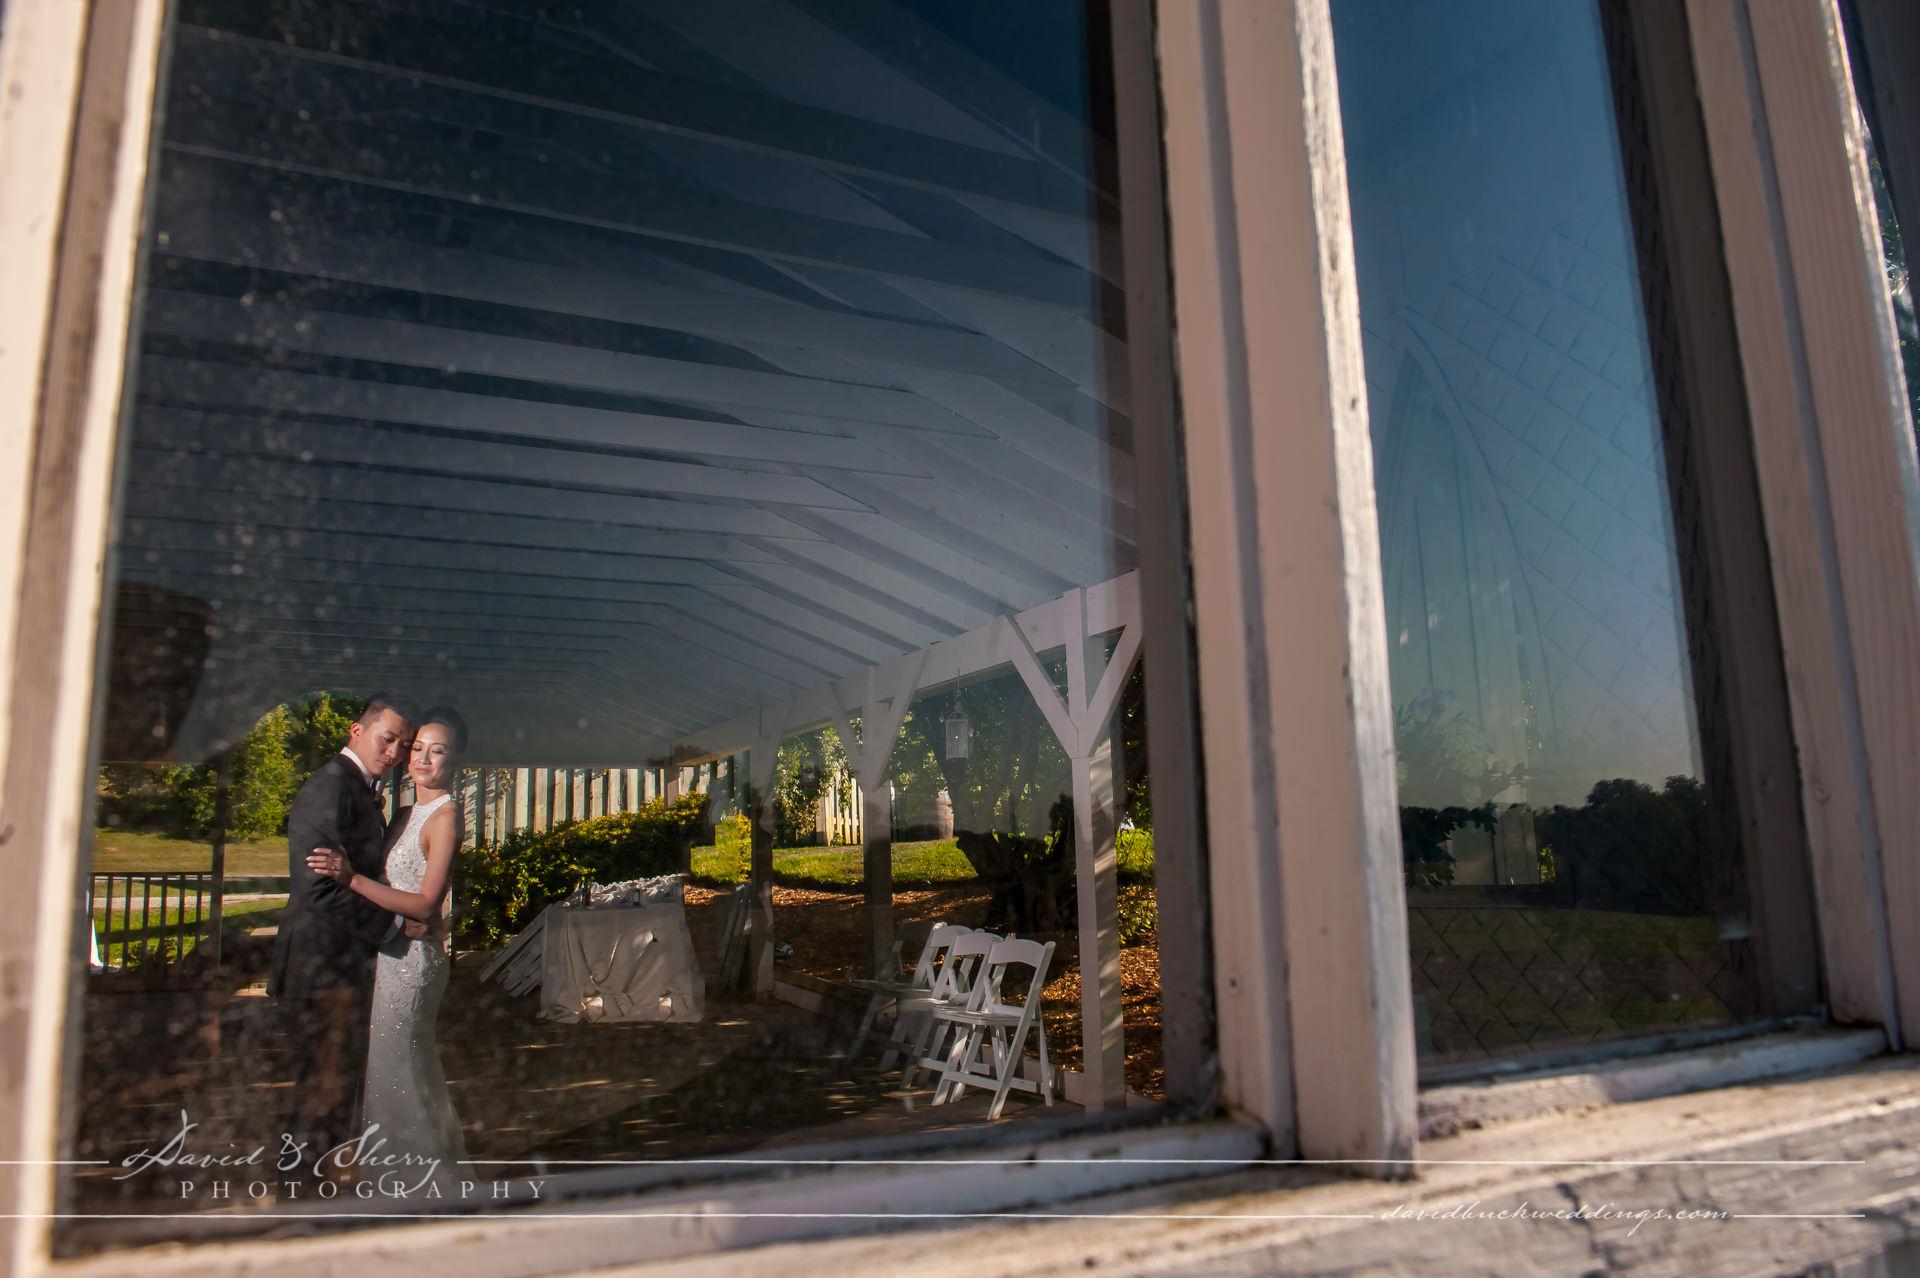 waterstone-estate-wedding-david-sherry-photography-simon-crystal-023